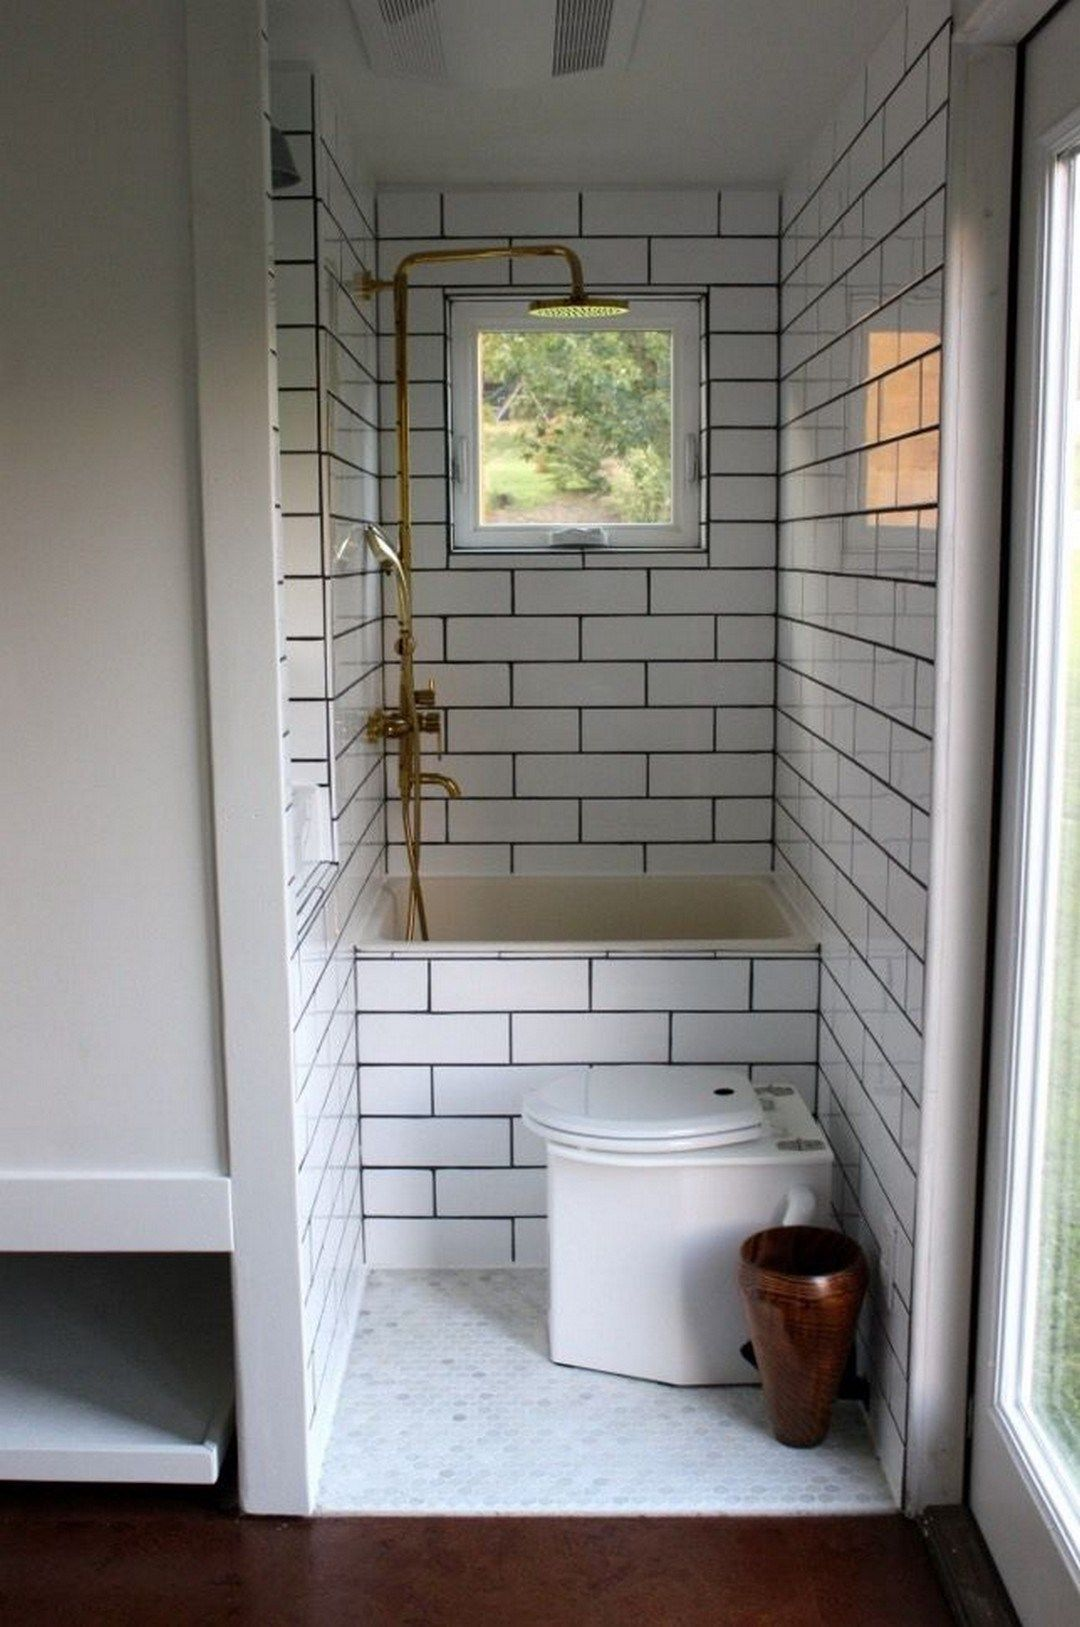 tiny house bathtub small space ideas 99 inspirational. Black Bedroom Furniture Sets. Home Design Ideas